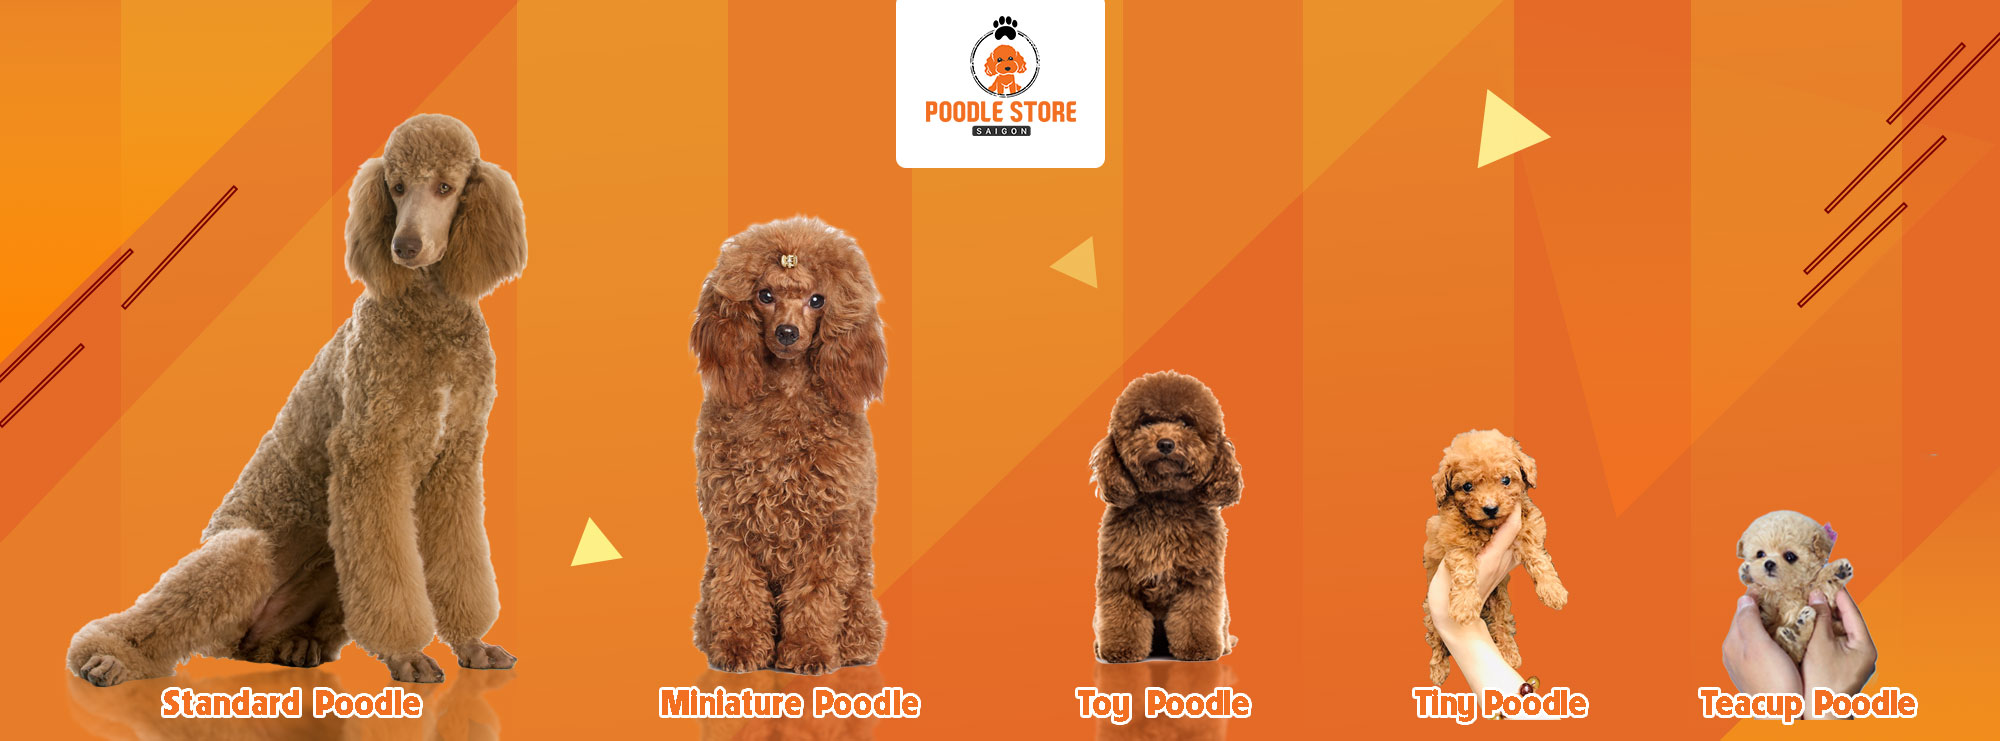 phân biệt các loại Poodle